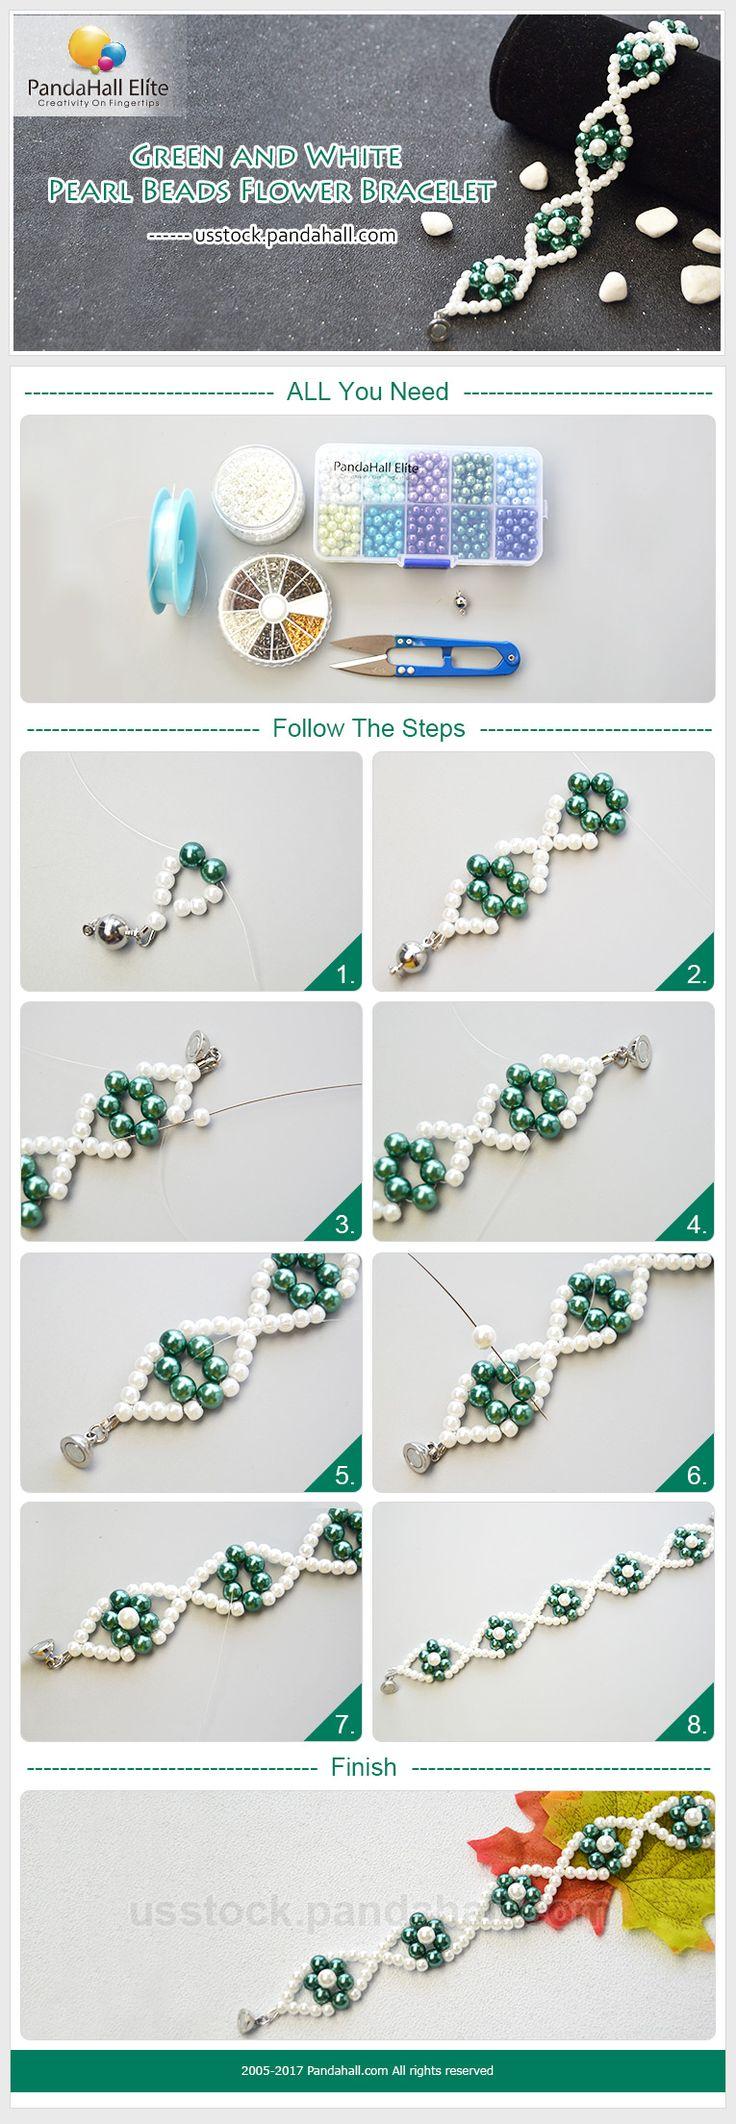 PandaHall Elite Craft Tutorial: How to DIY pearl bracelet with PandaHall Elite pearl beads #pandahallelite #pearl #pearlbracelet #pearlbeads #bracelet #jewelry #craft #crafttutorial